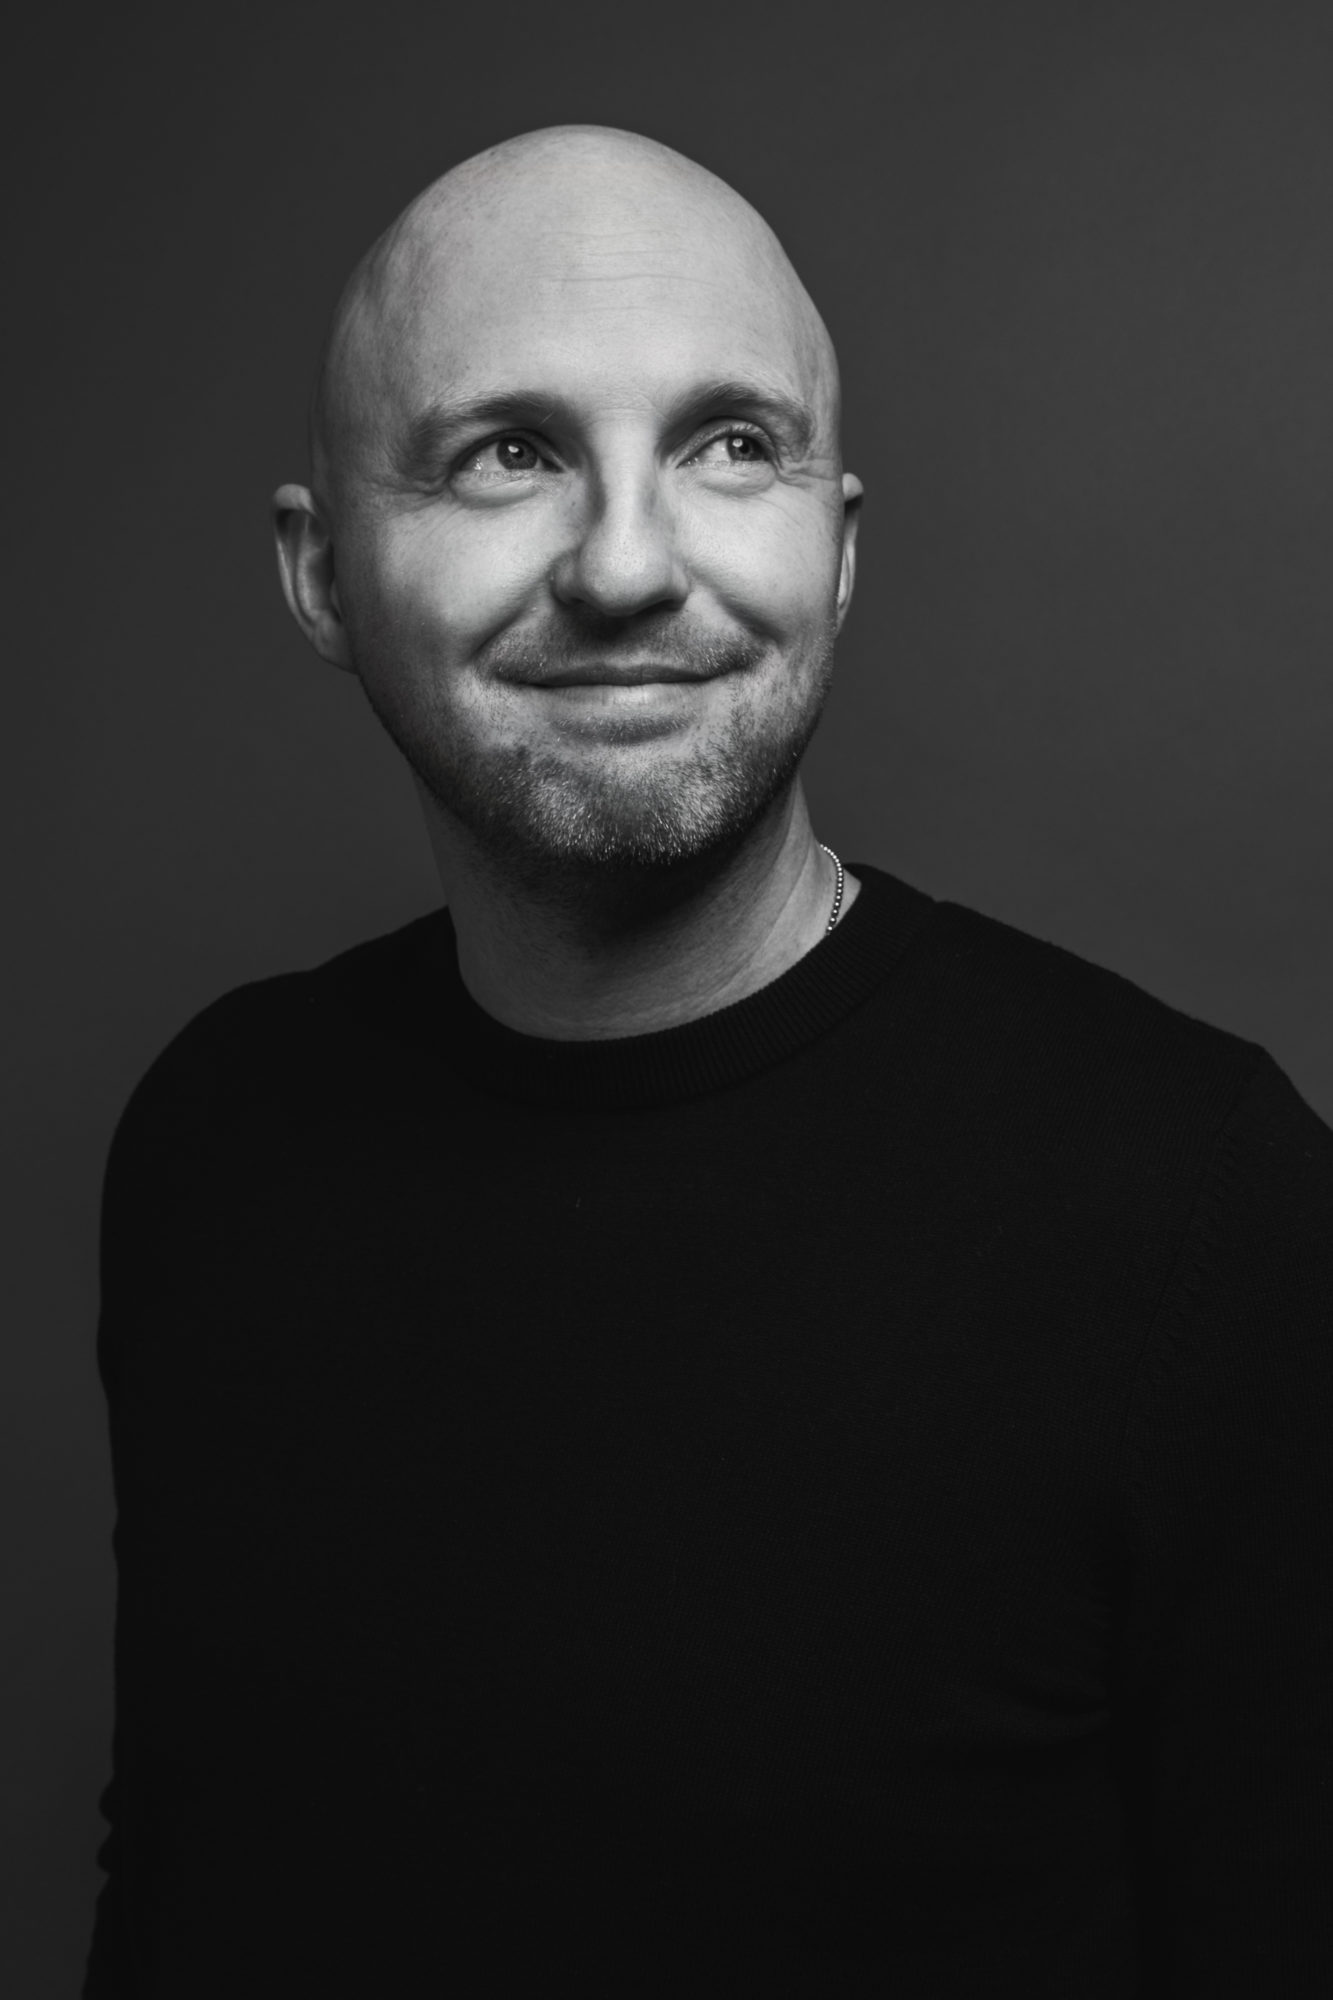 Chris Barney | 2021 40 Under 40